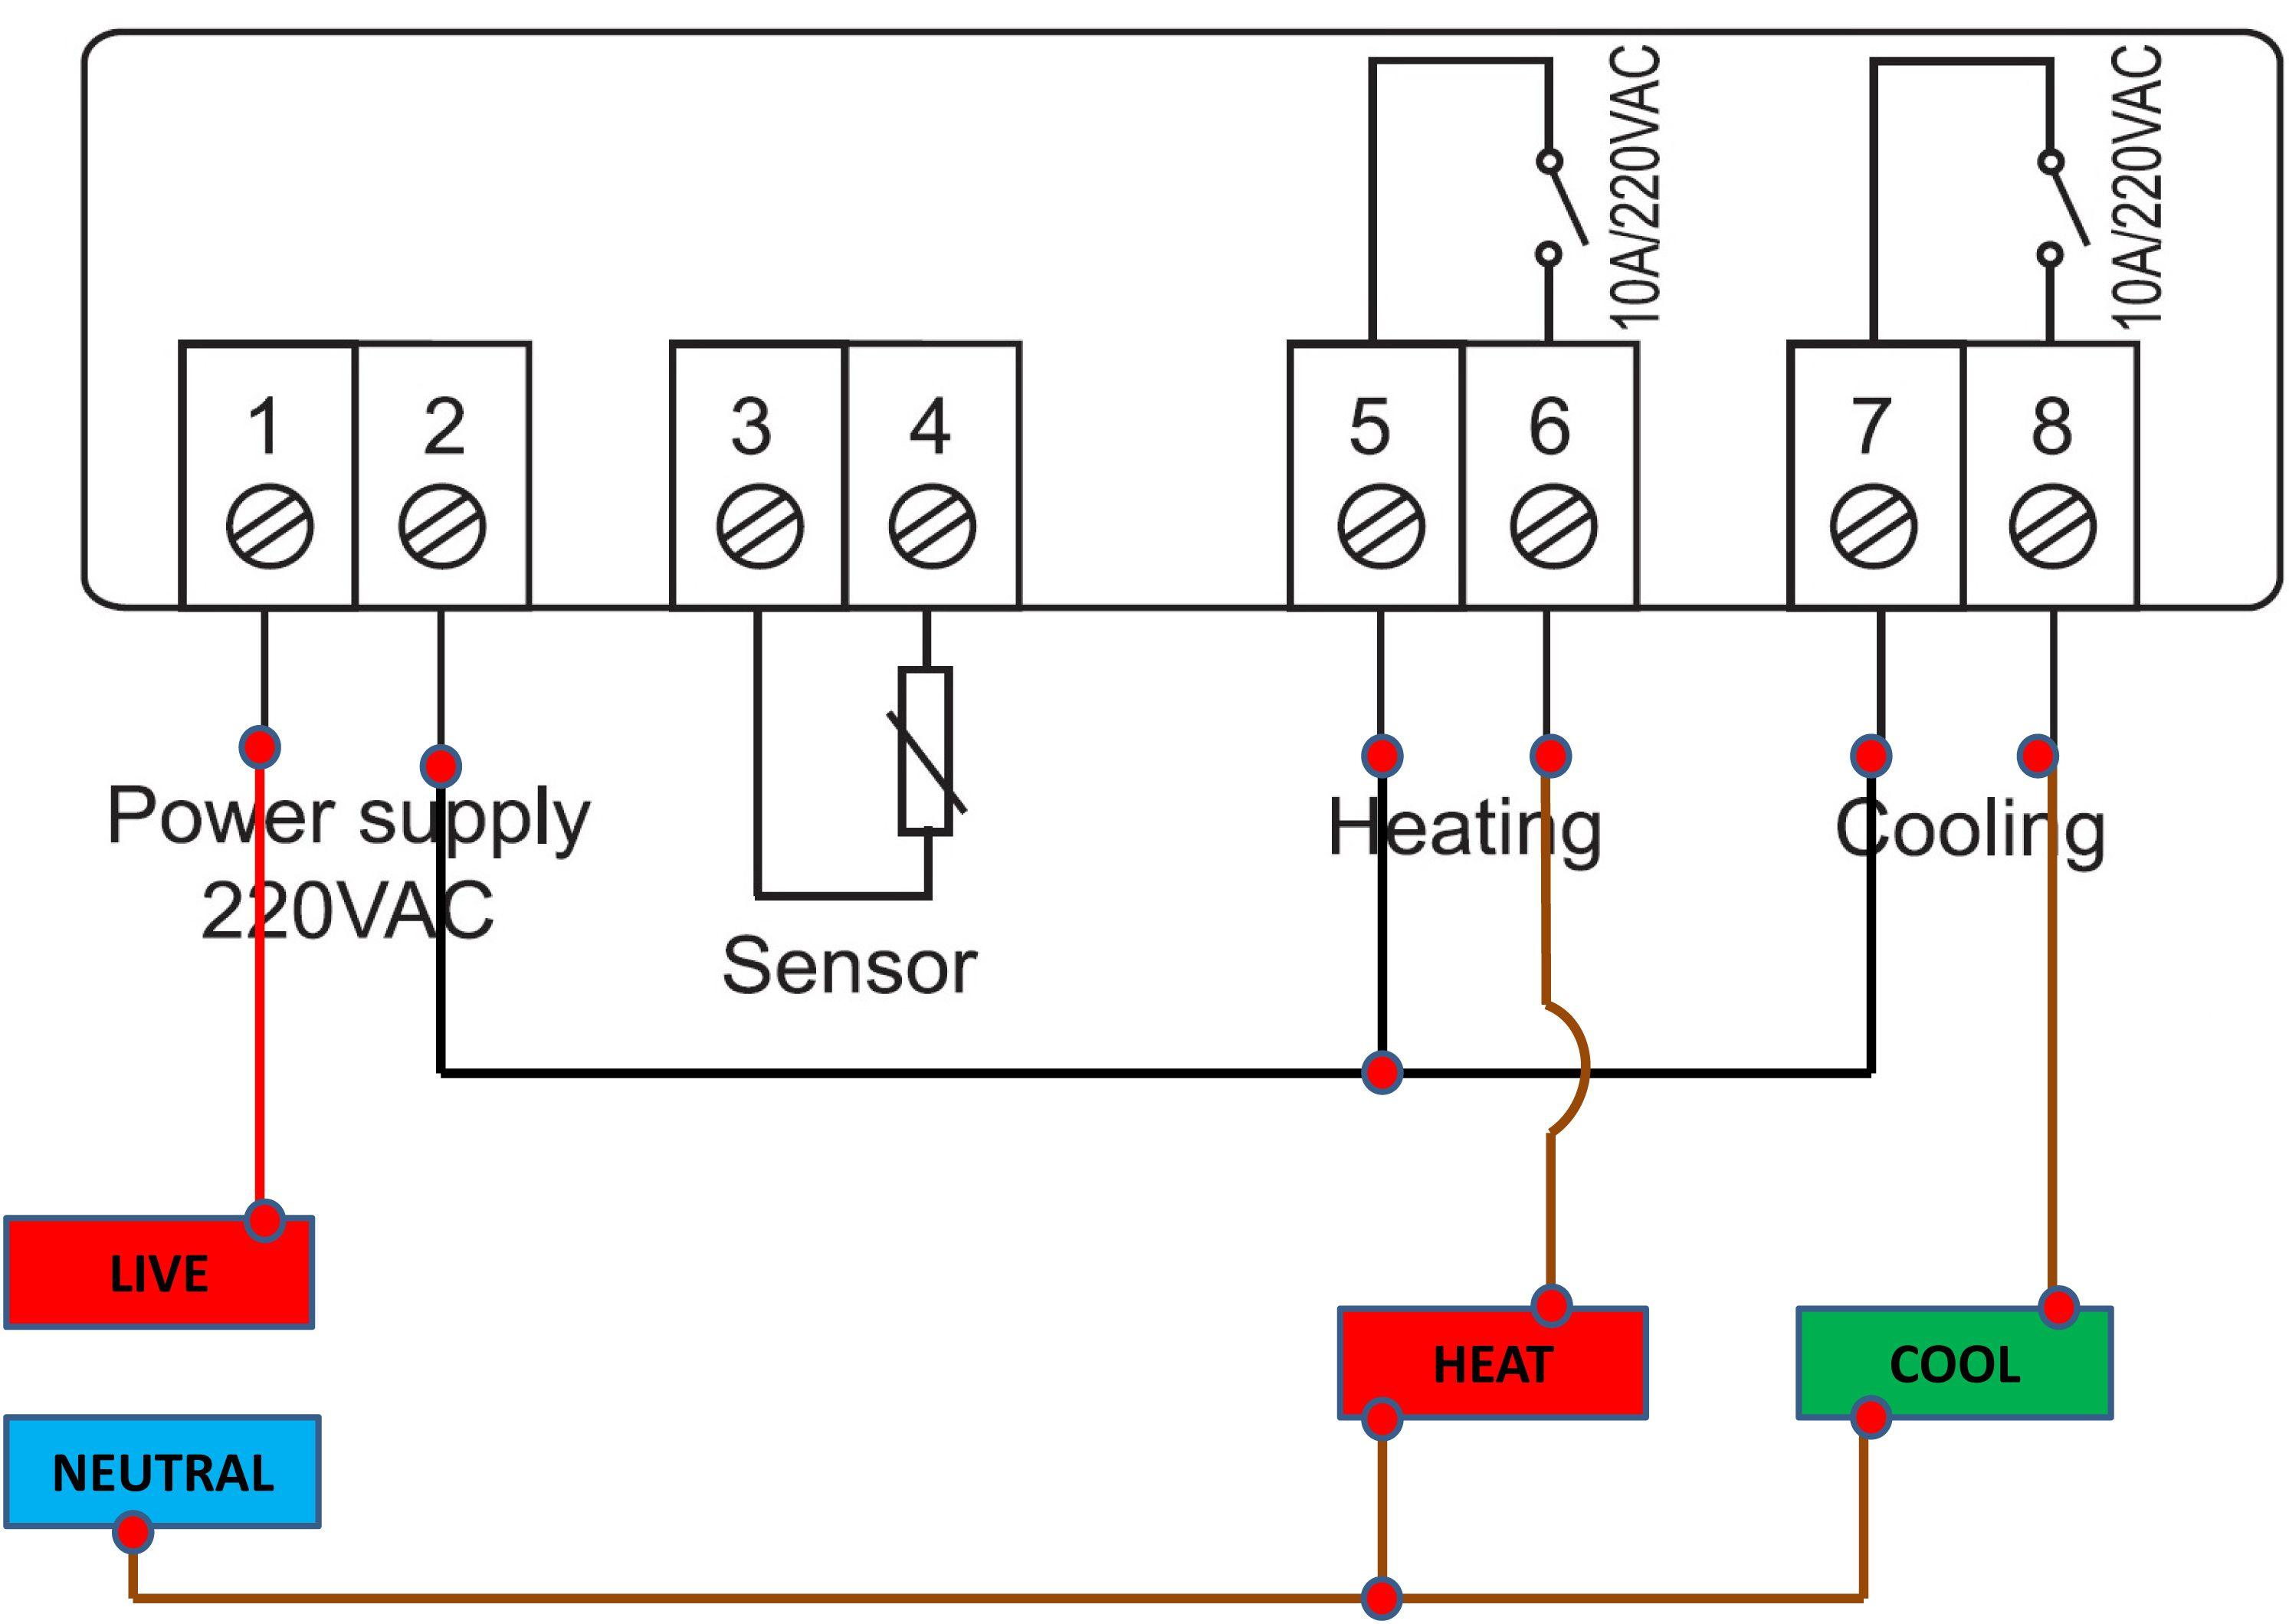 the elitech stc 1000 temeprature controller schematic diagram www stc 1000 wiring diagram uk [ 2987 x 2119 Pixel ]